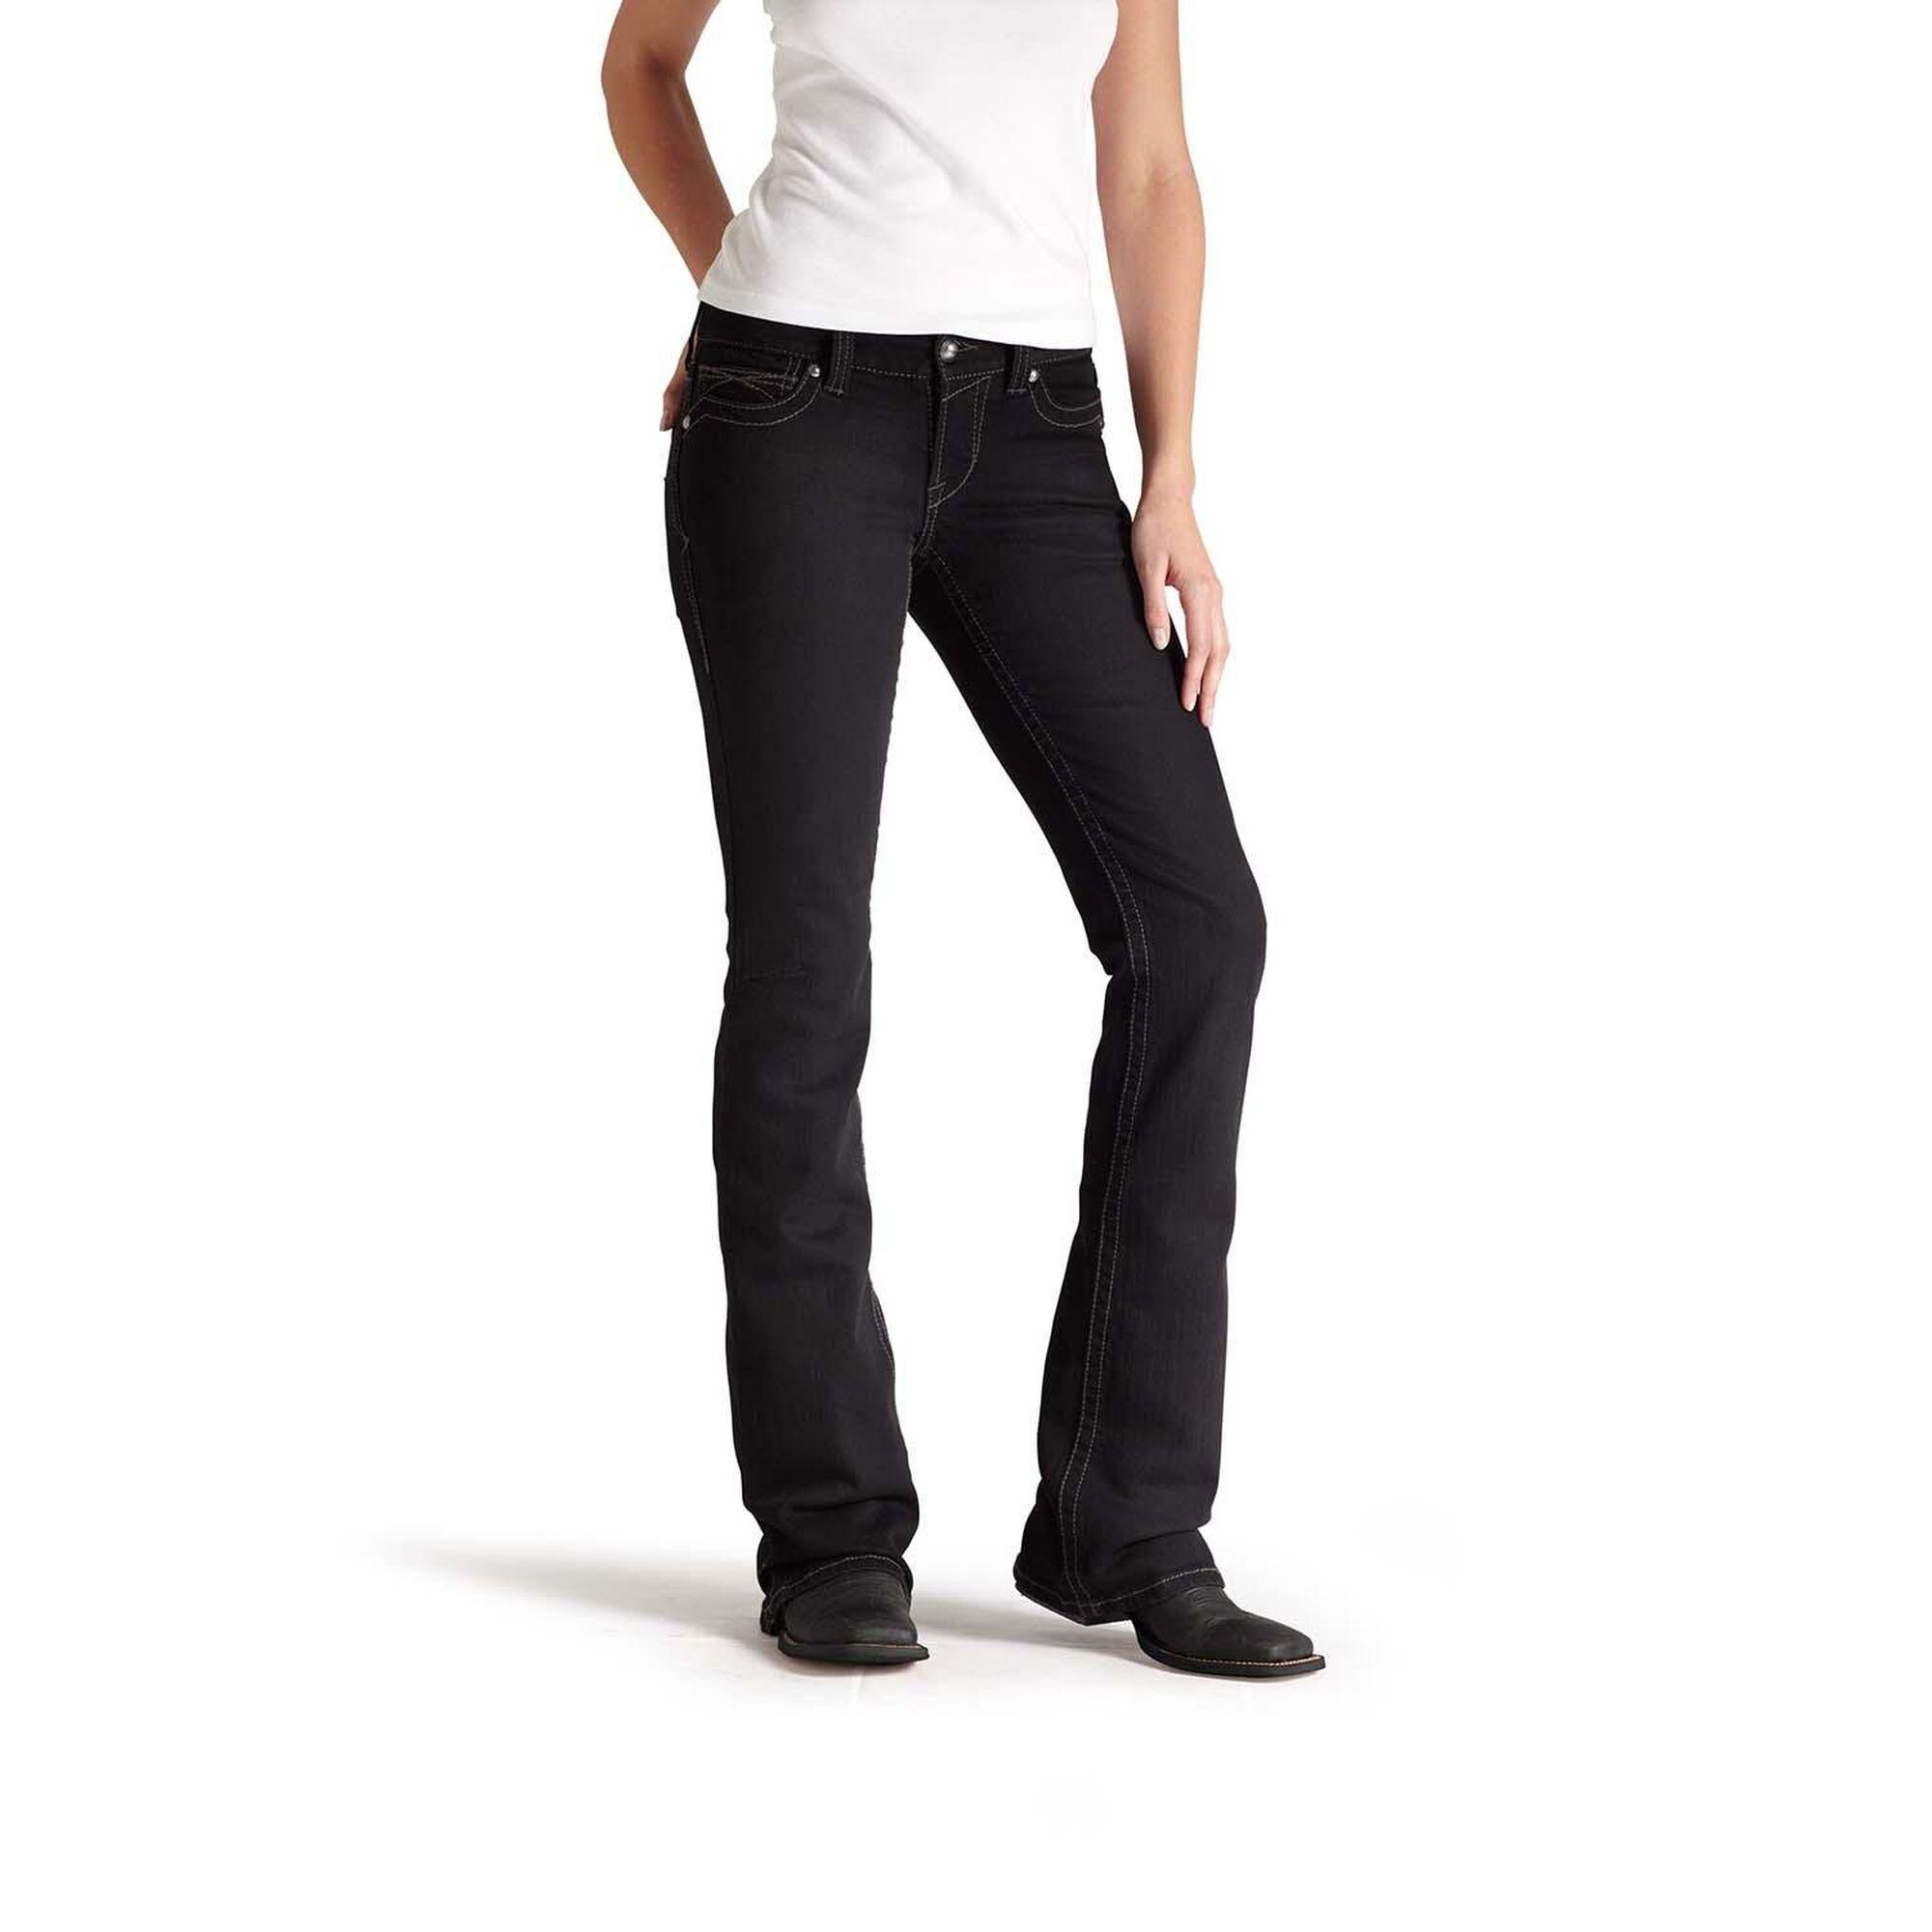 R.E.A.L Mid Rise Black Boot Cut Jean